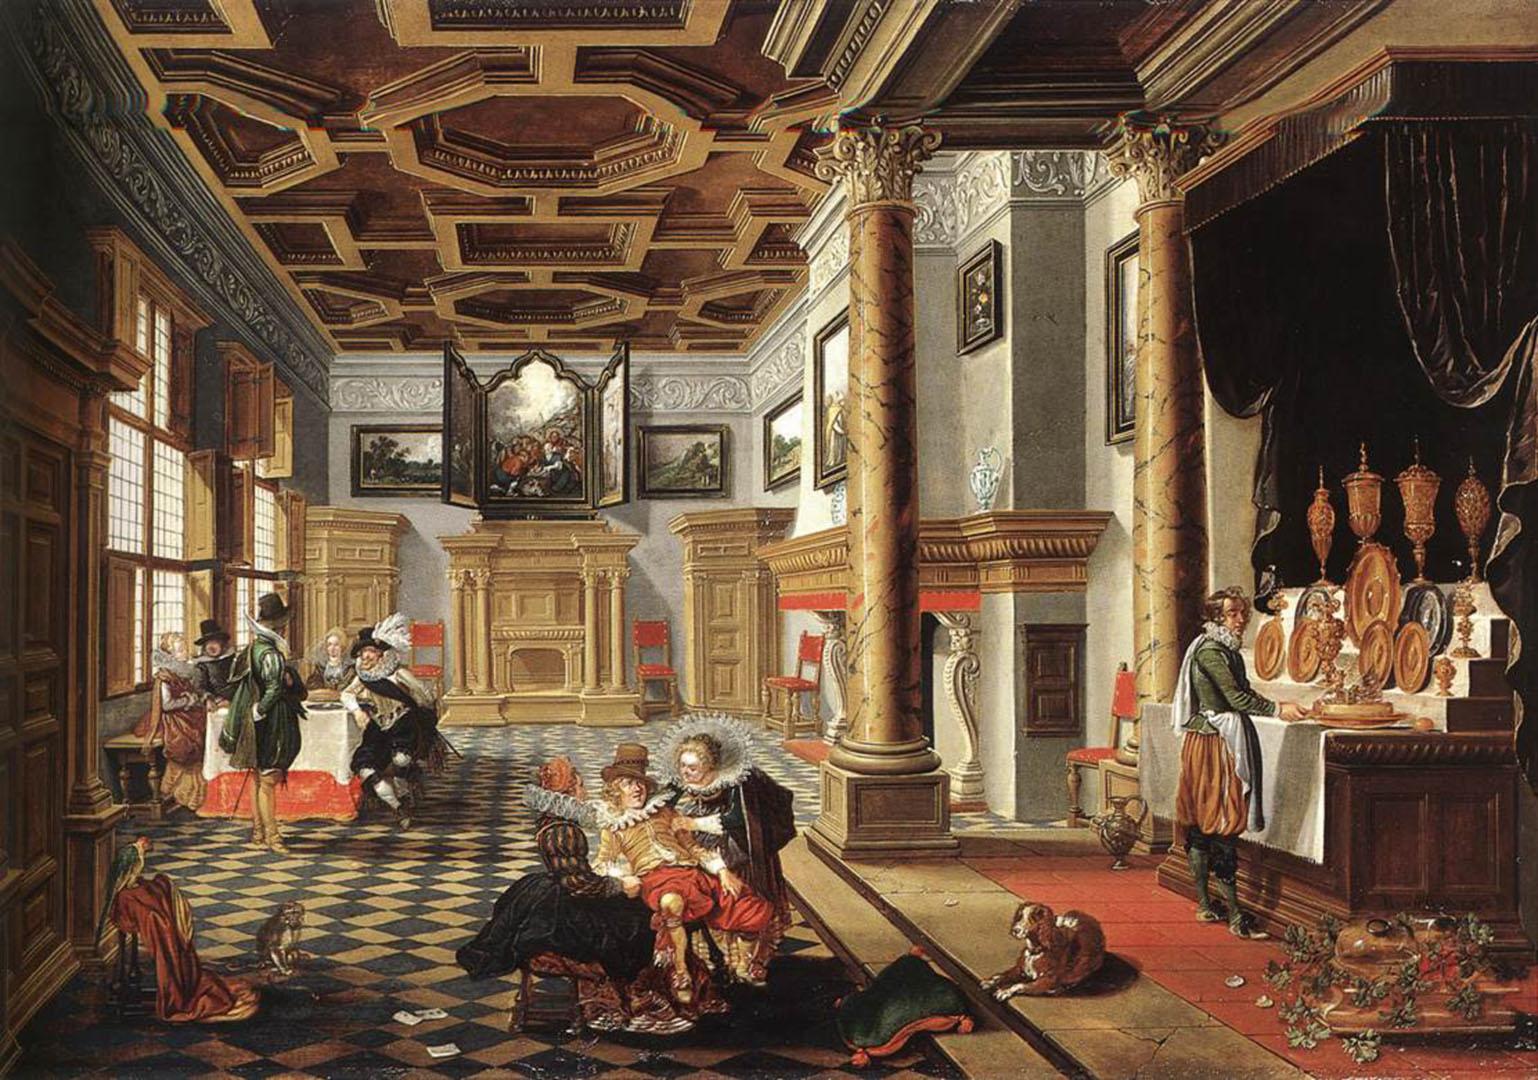 Renaissance Interior With Banqueters   Danish Art Wallpaper Image 1538x1080